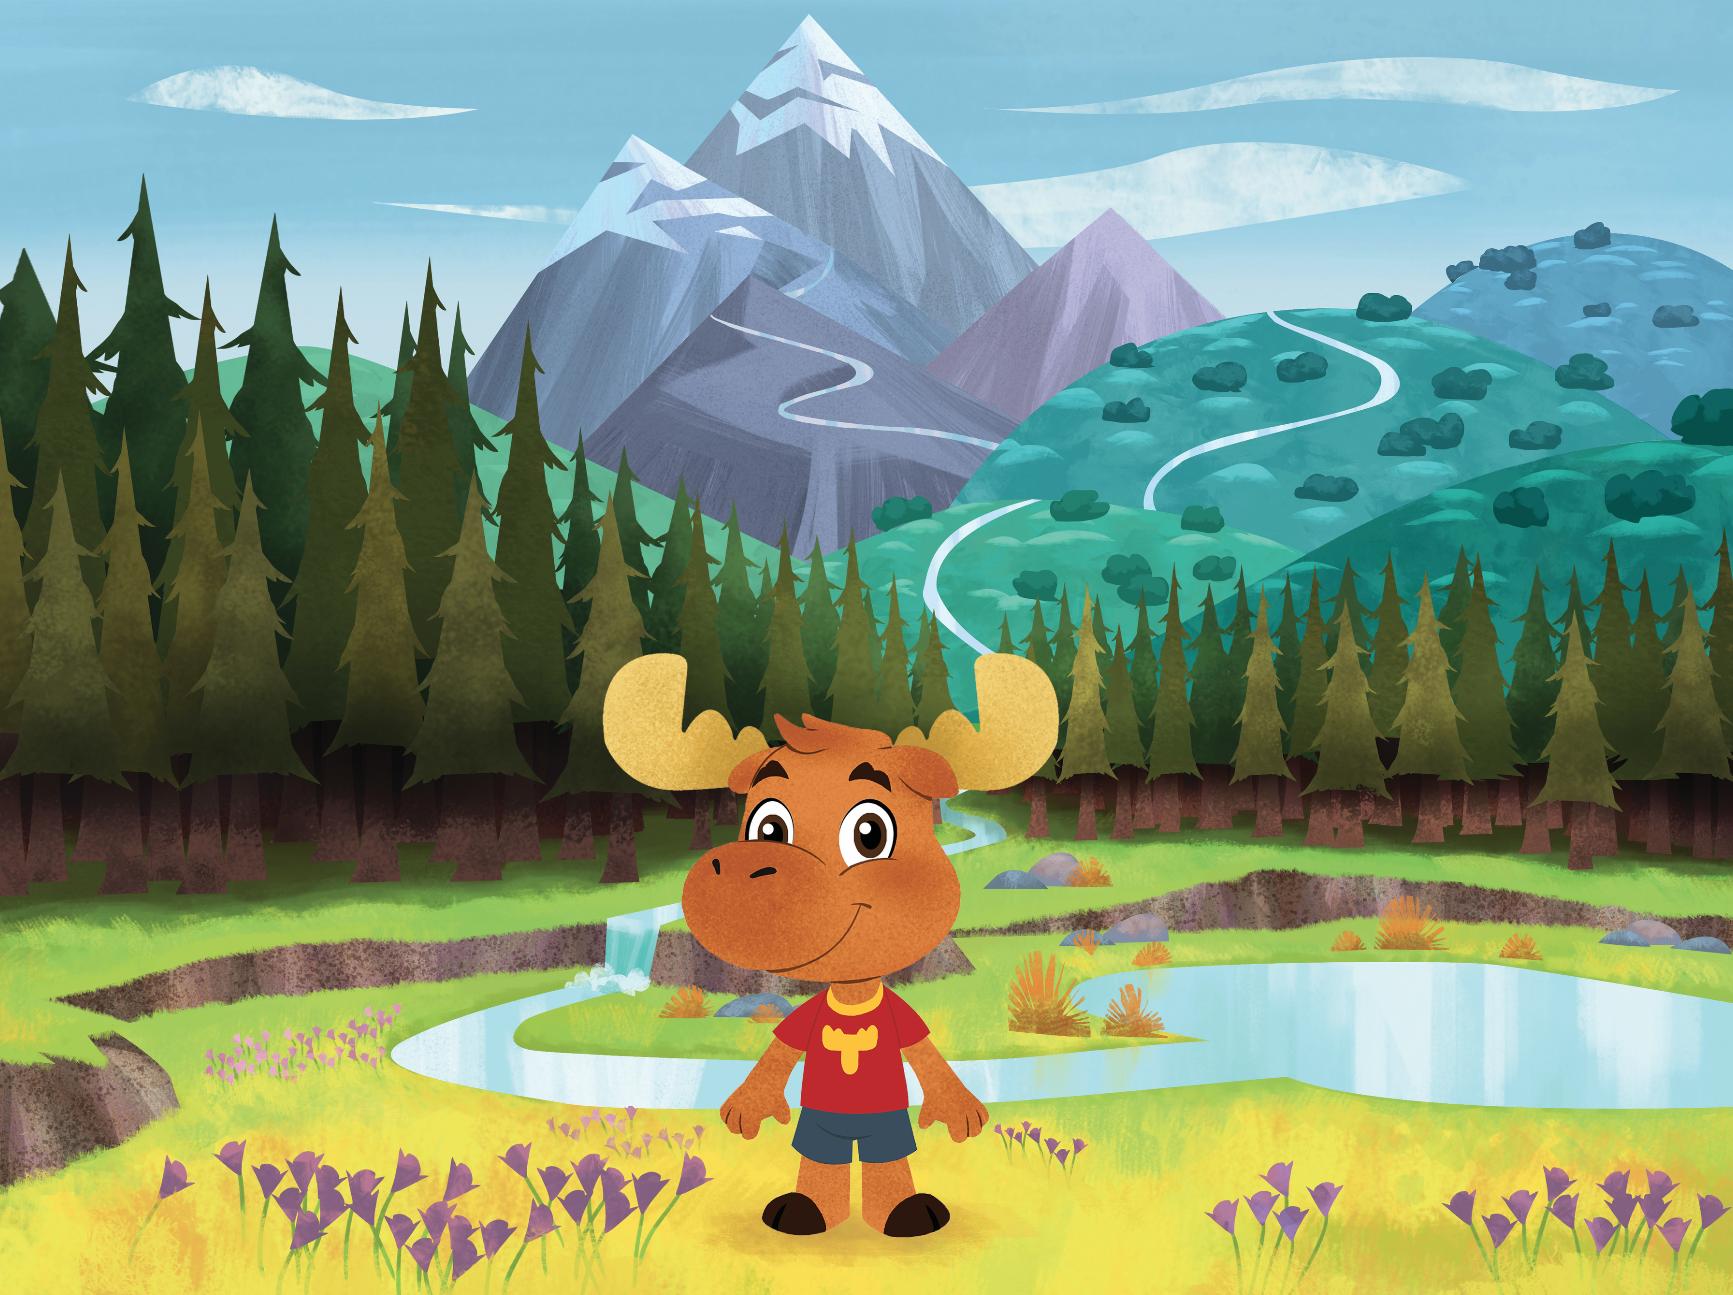 Illustration by Pixel Pirate Studios